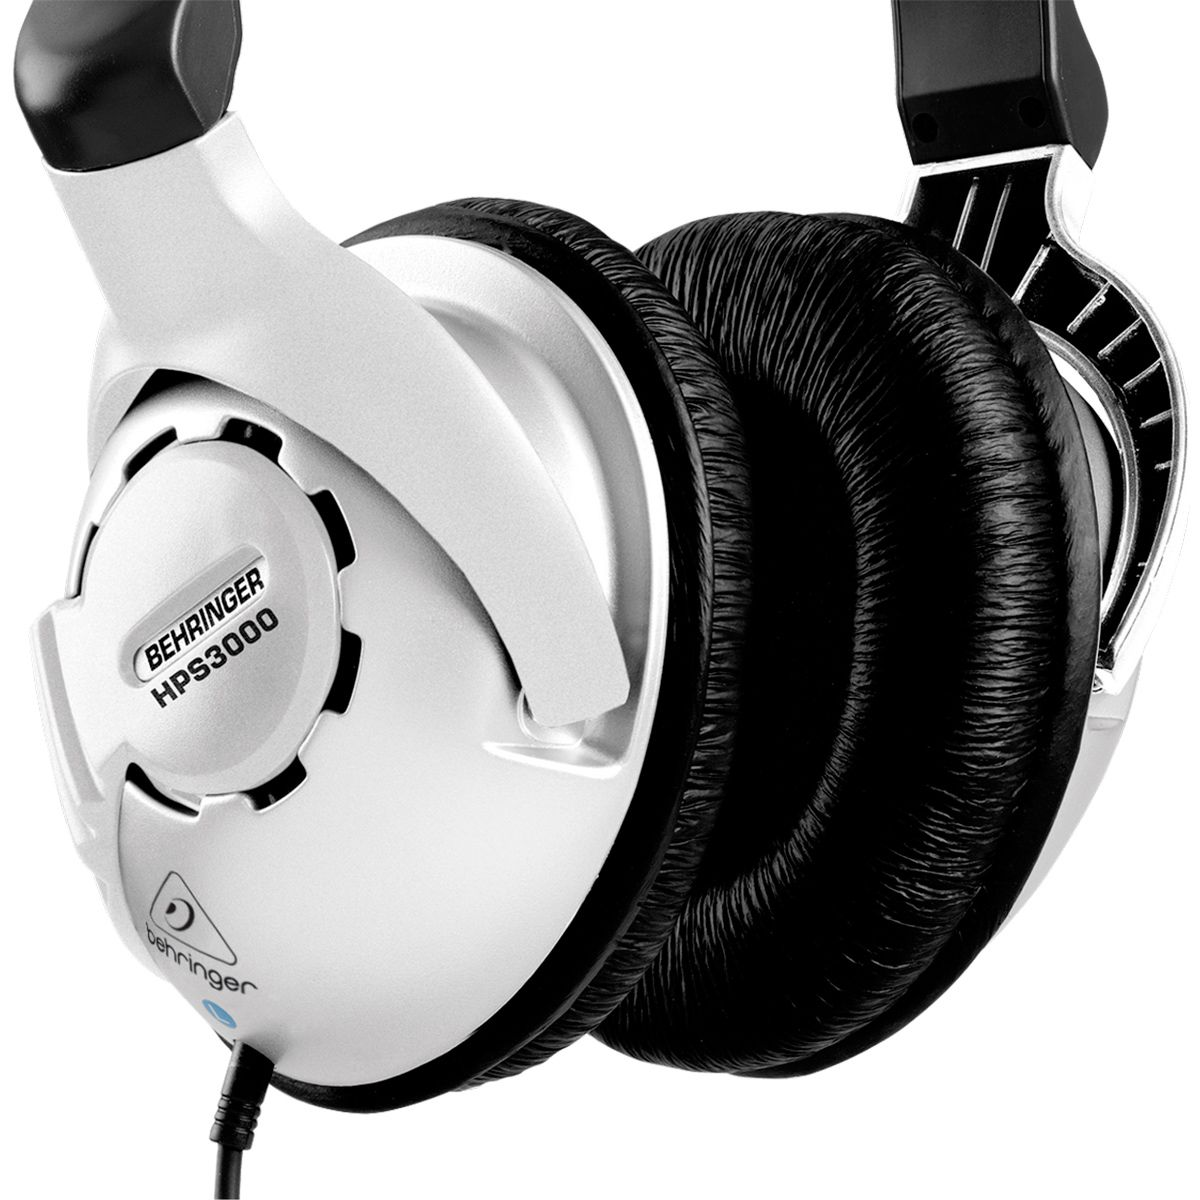 Fone de Ouvido Behringer HPS3000 High Performance Over Ear